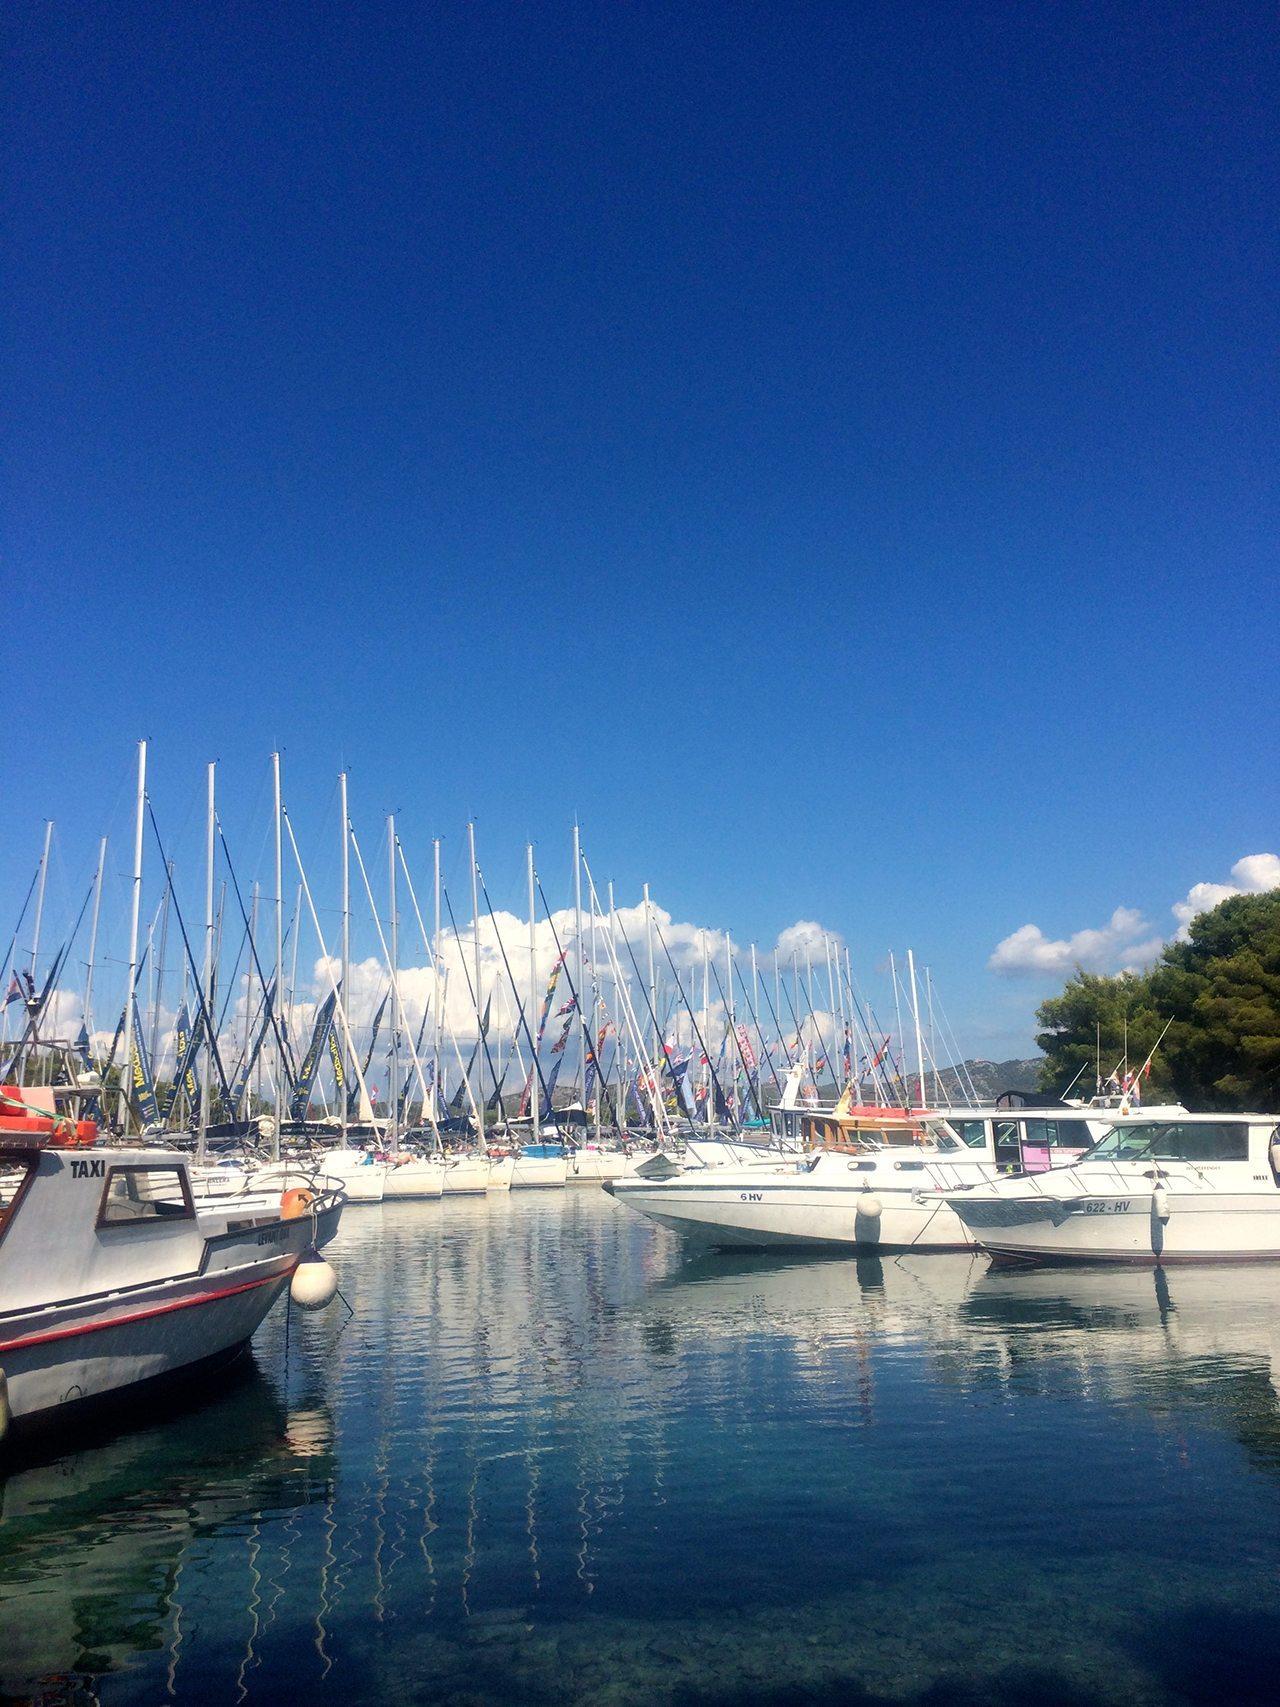 MedSailors Hvar Party Island Croatia Boats Docked